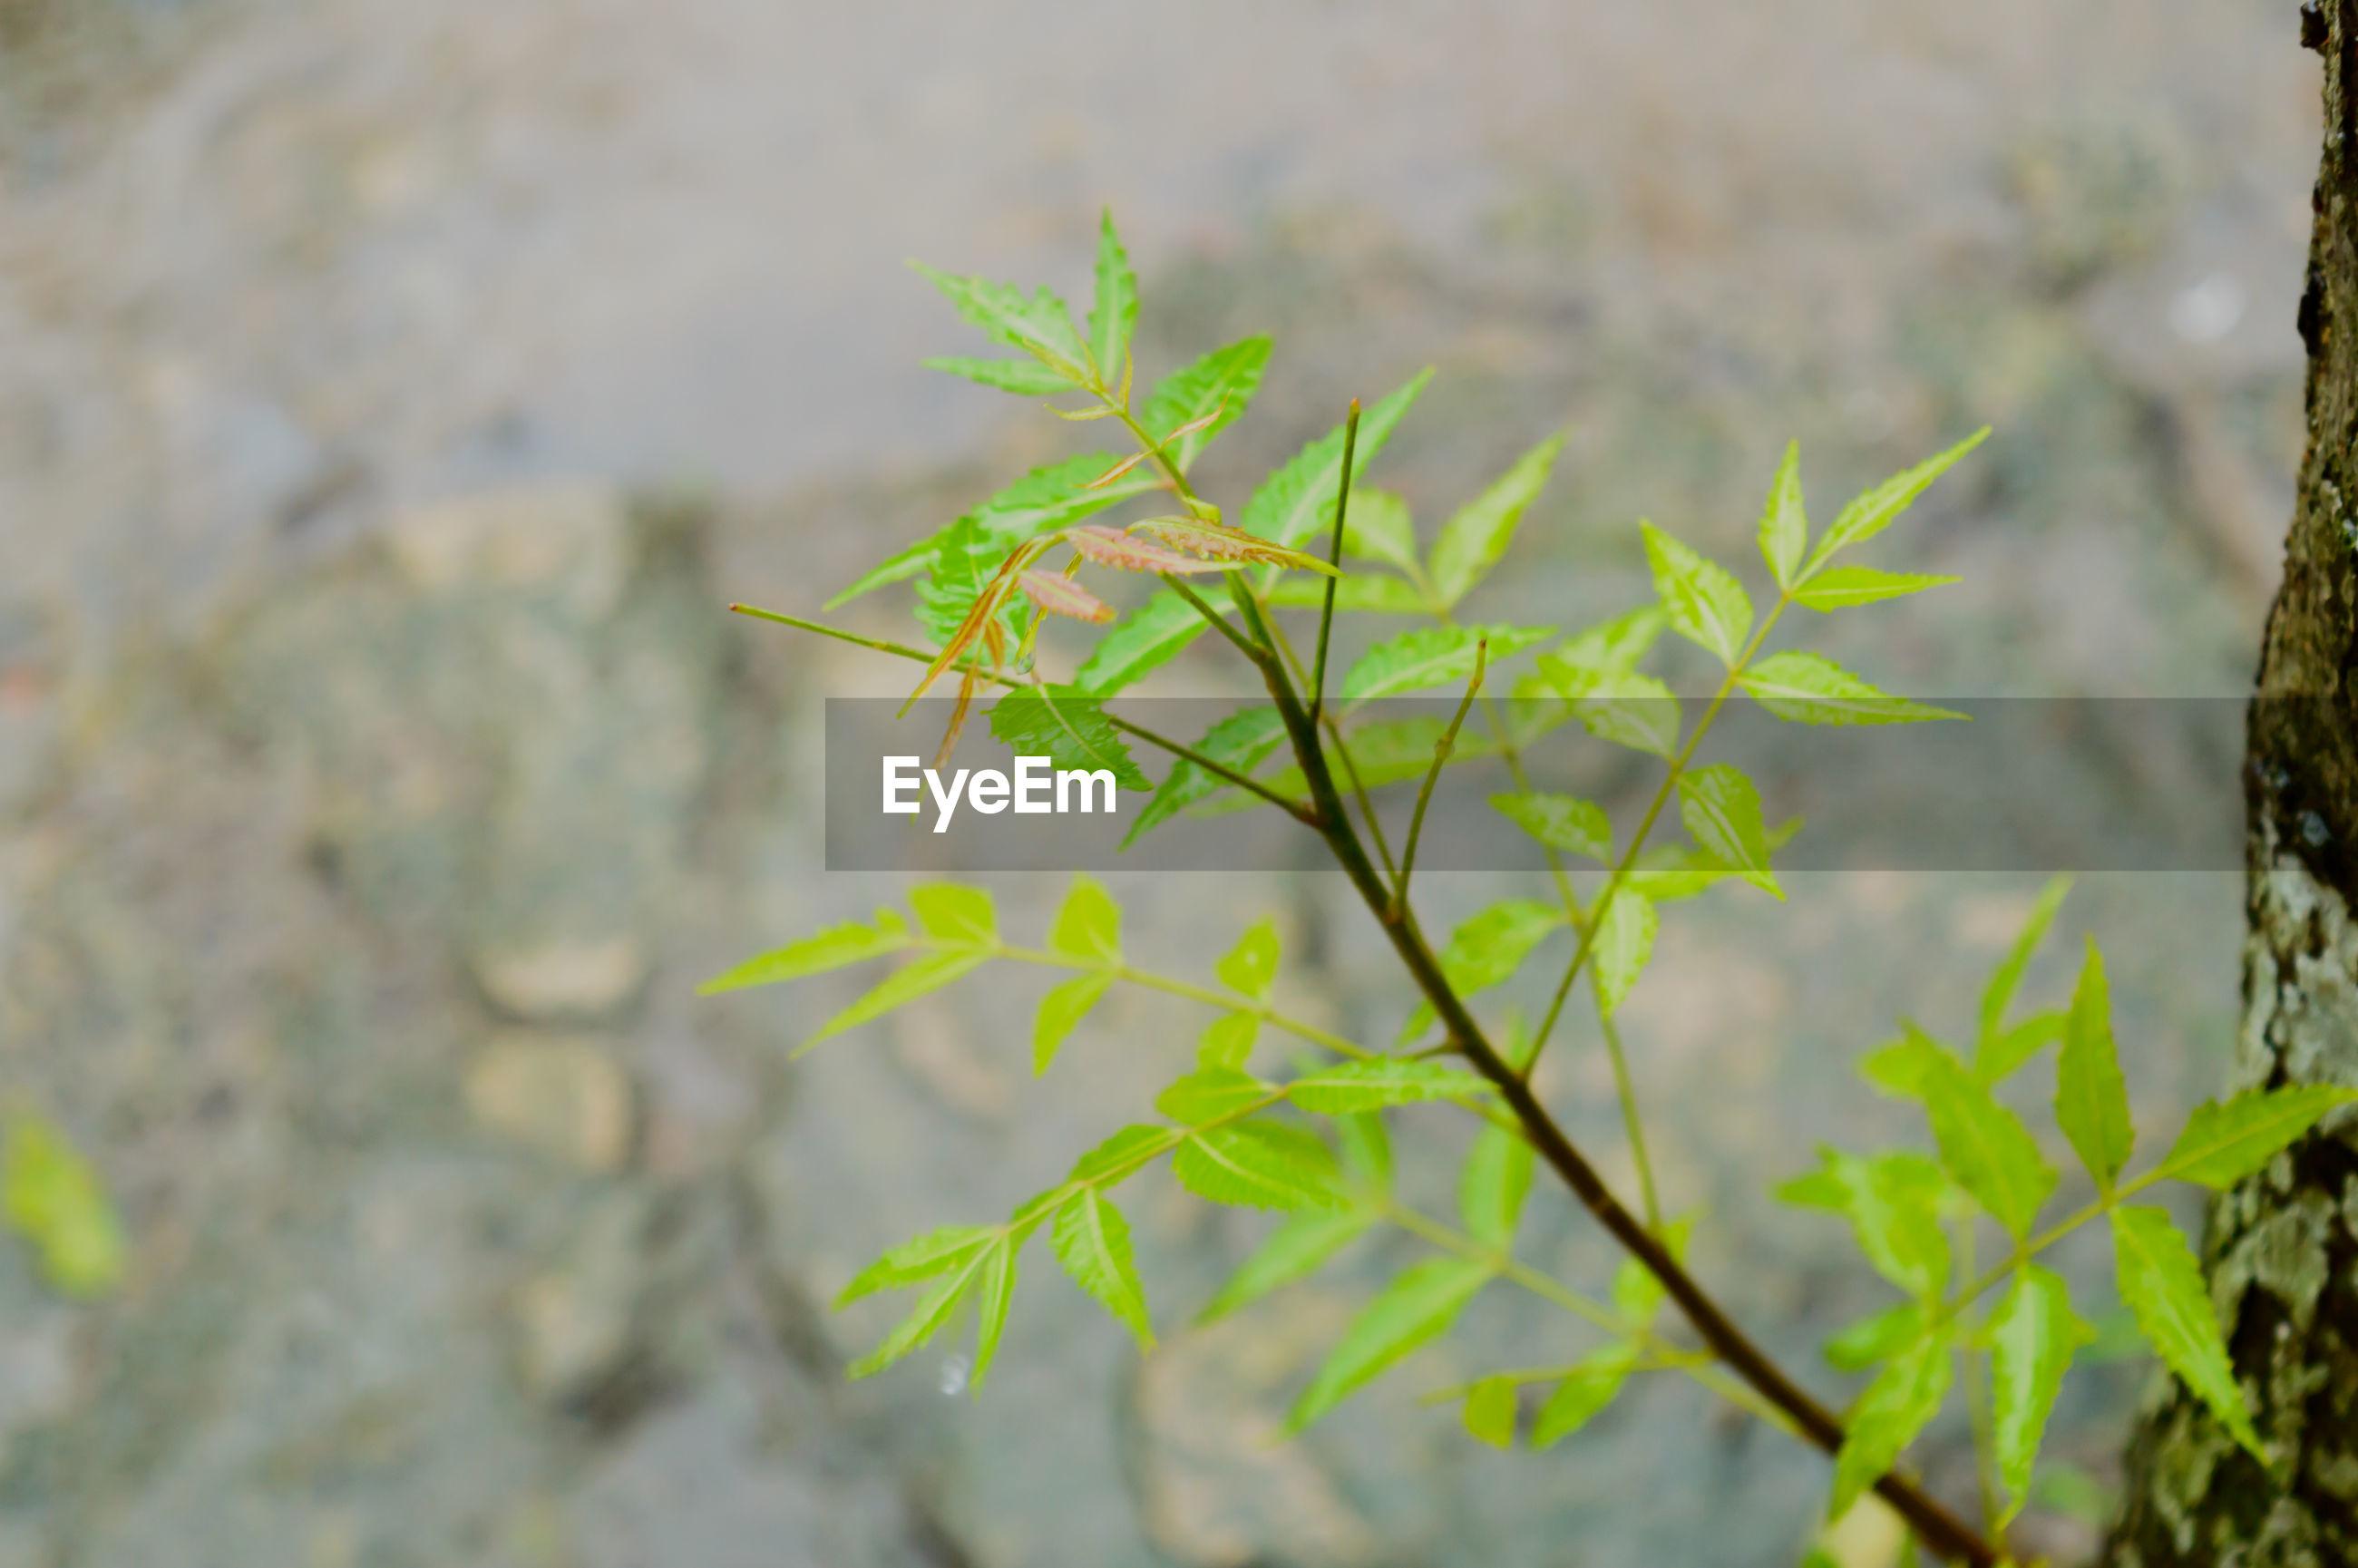 CLOSE-UP OF FRESH PLANT